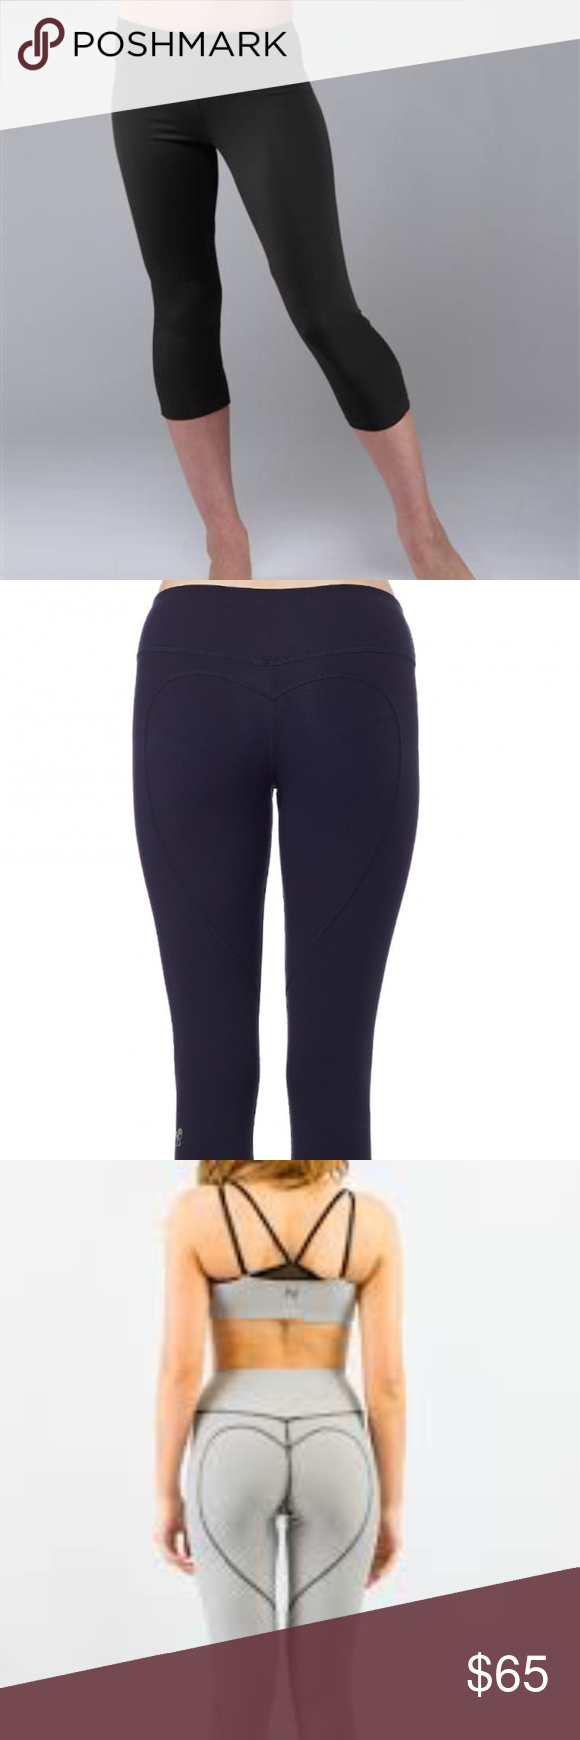 7ff7807f0e81f NWT Nina B Roze Heart Butt Capri in Black NWT These luxury capri yoga pants  have